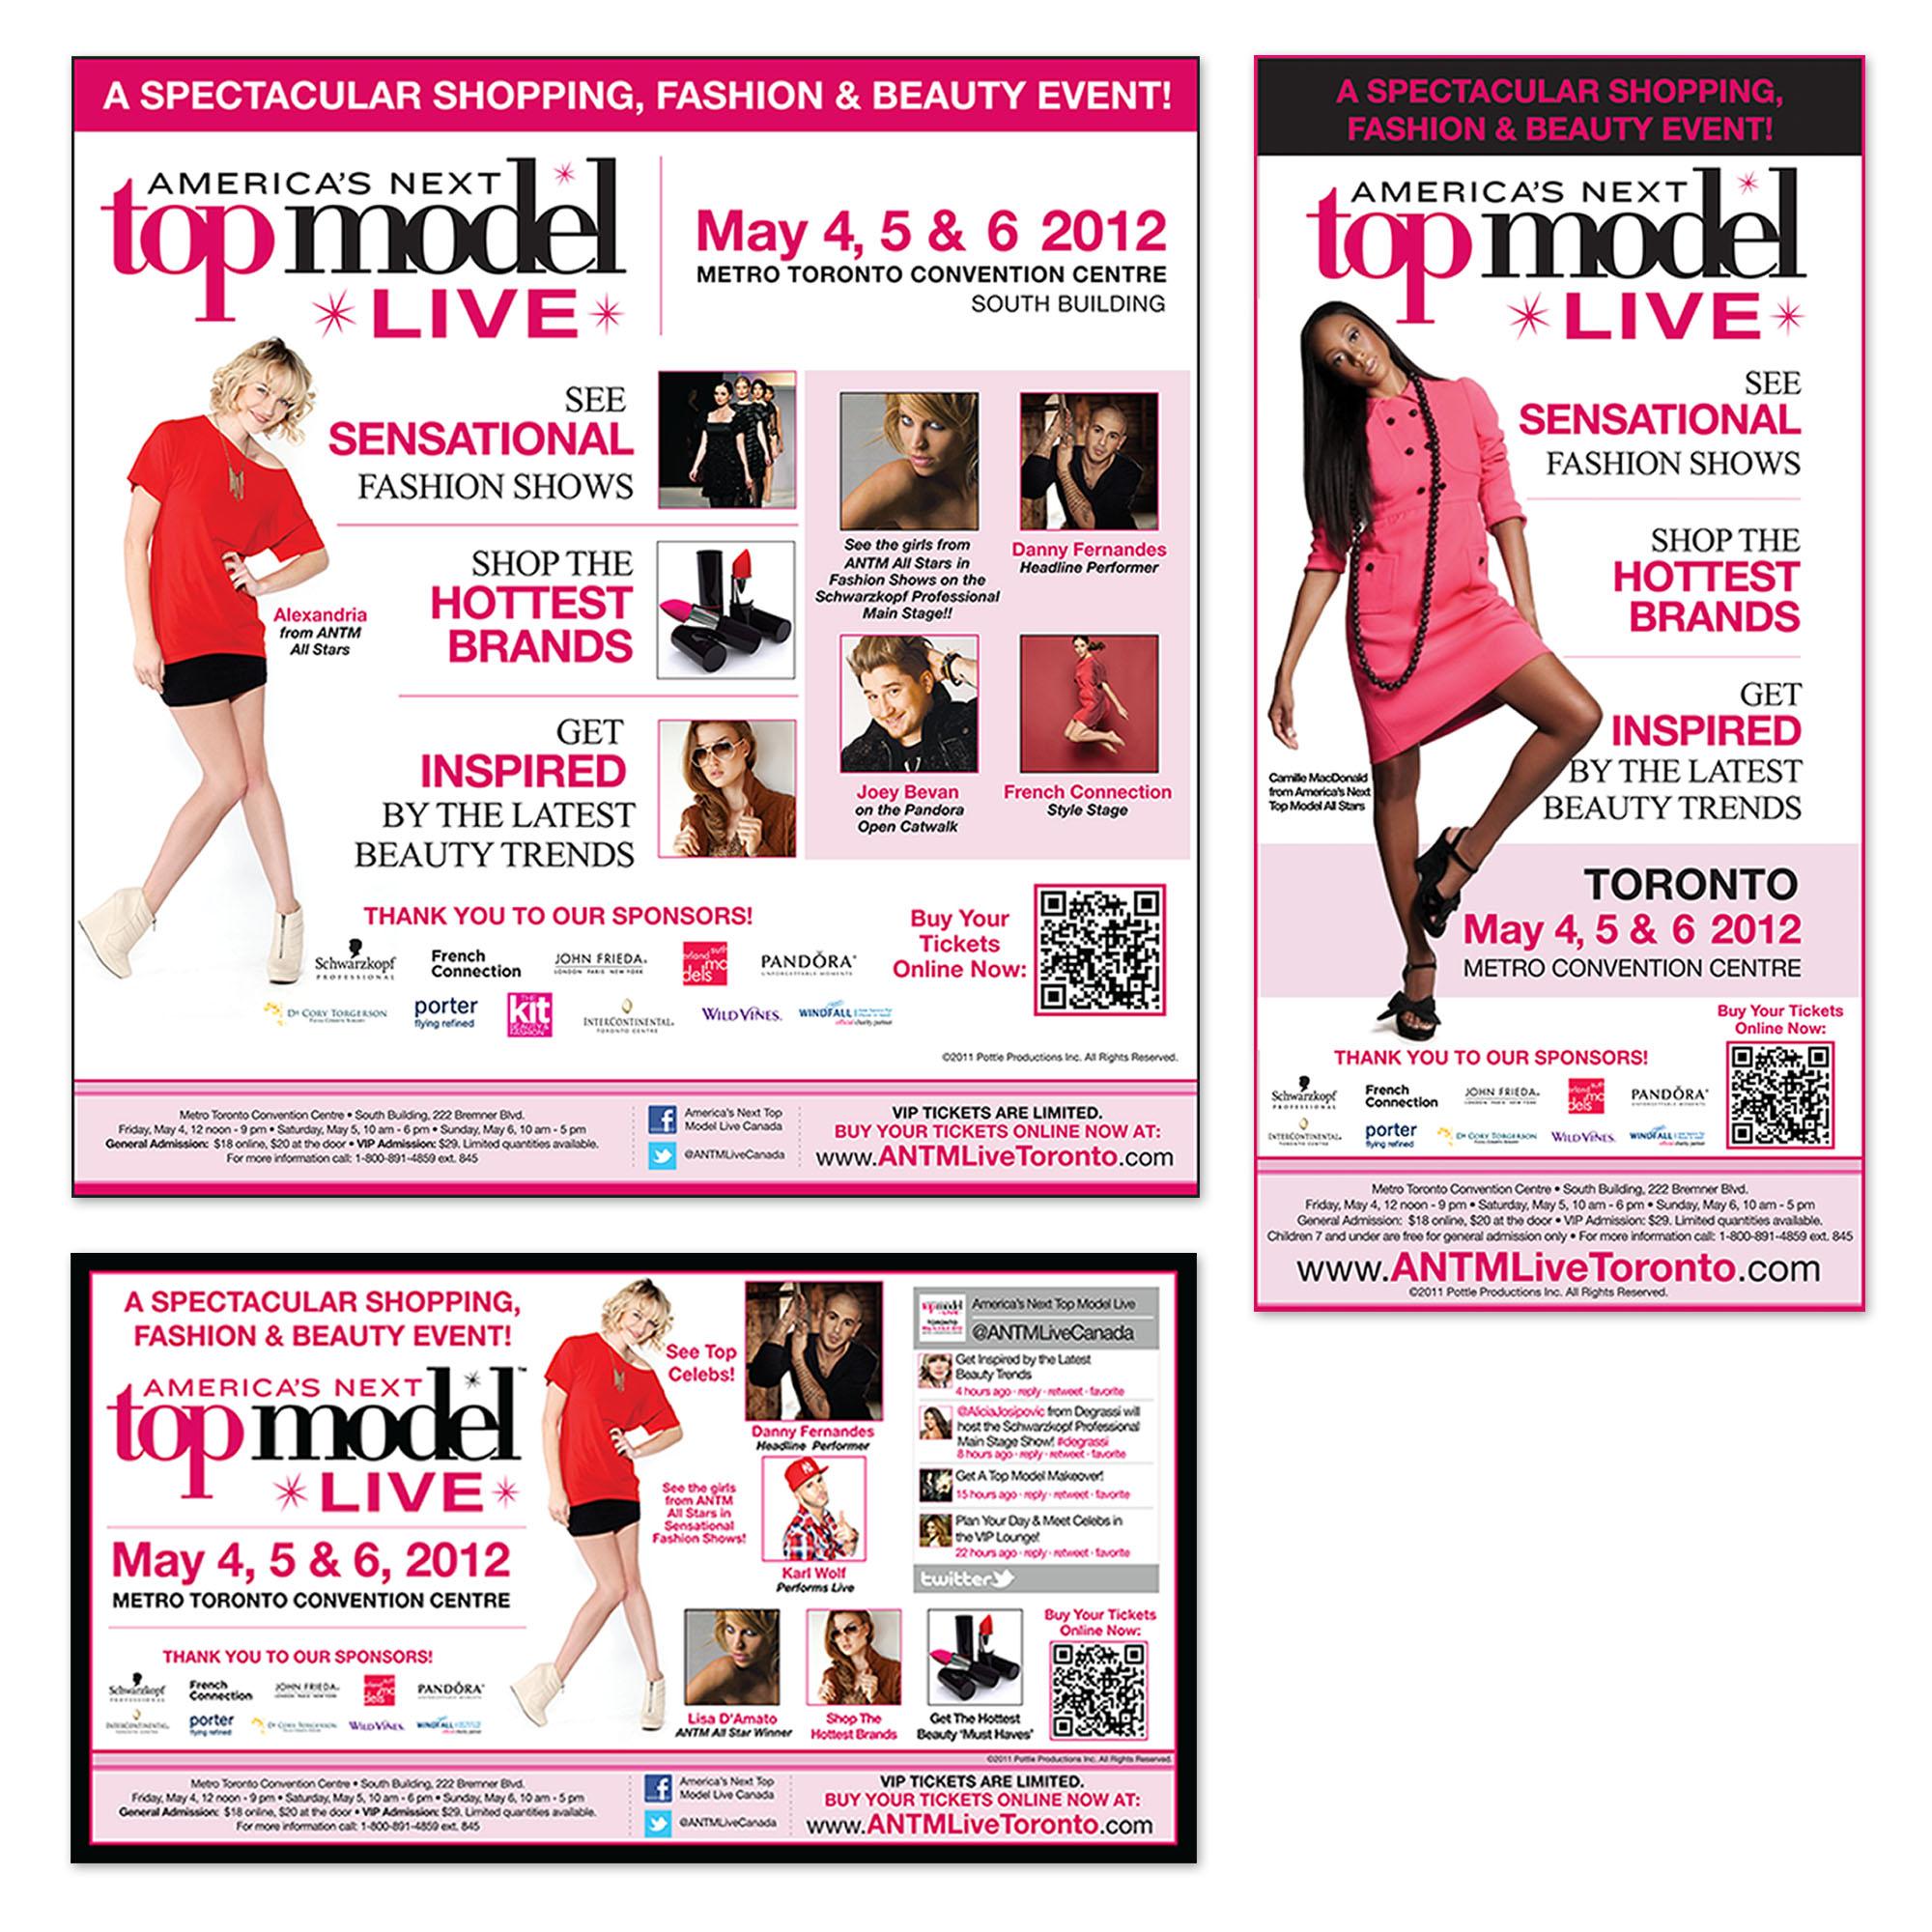 America's Next Top Model Show - Print Ads